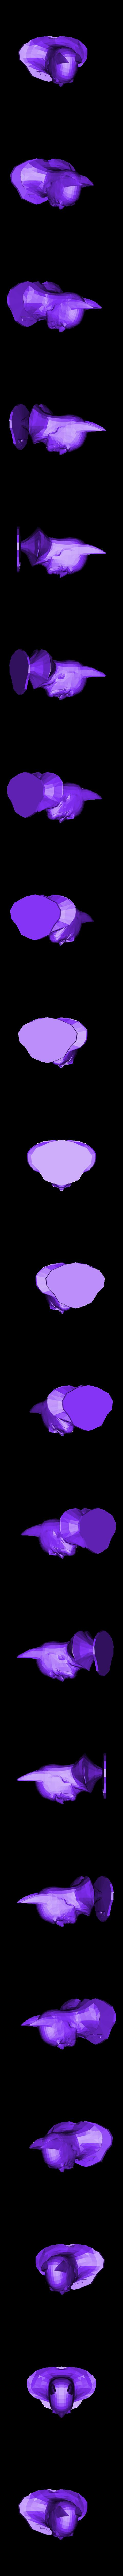 bat-busto.stl Download free STL file Batman Arkham Asylum Bust • 3D printer object, CaiquedeAndrade